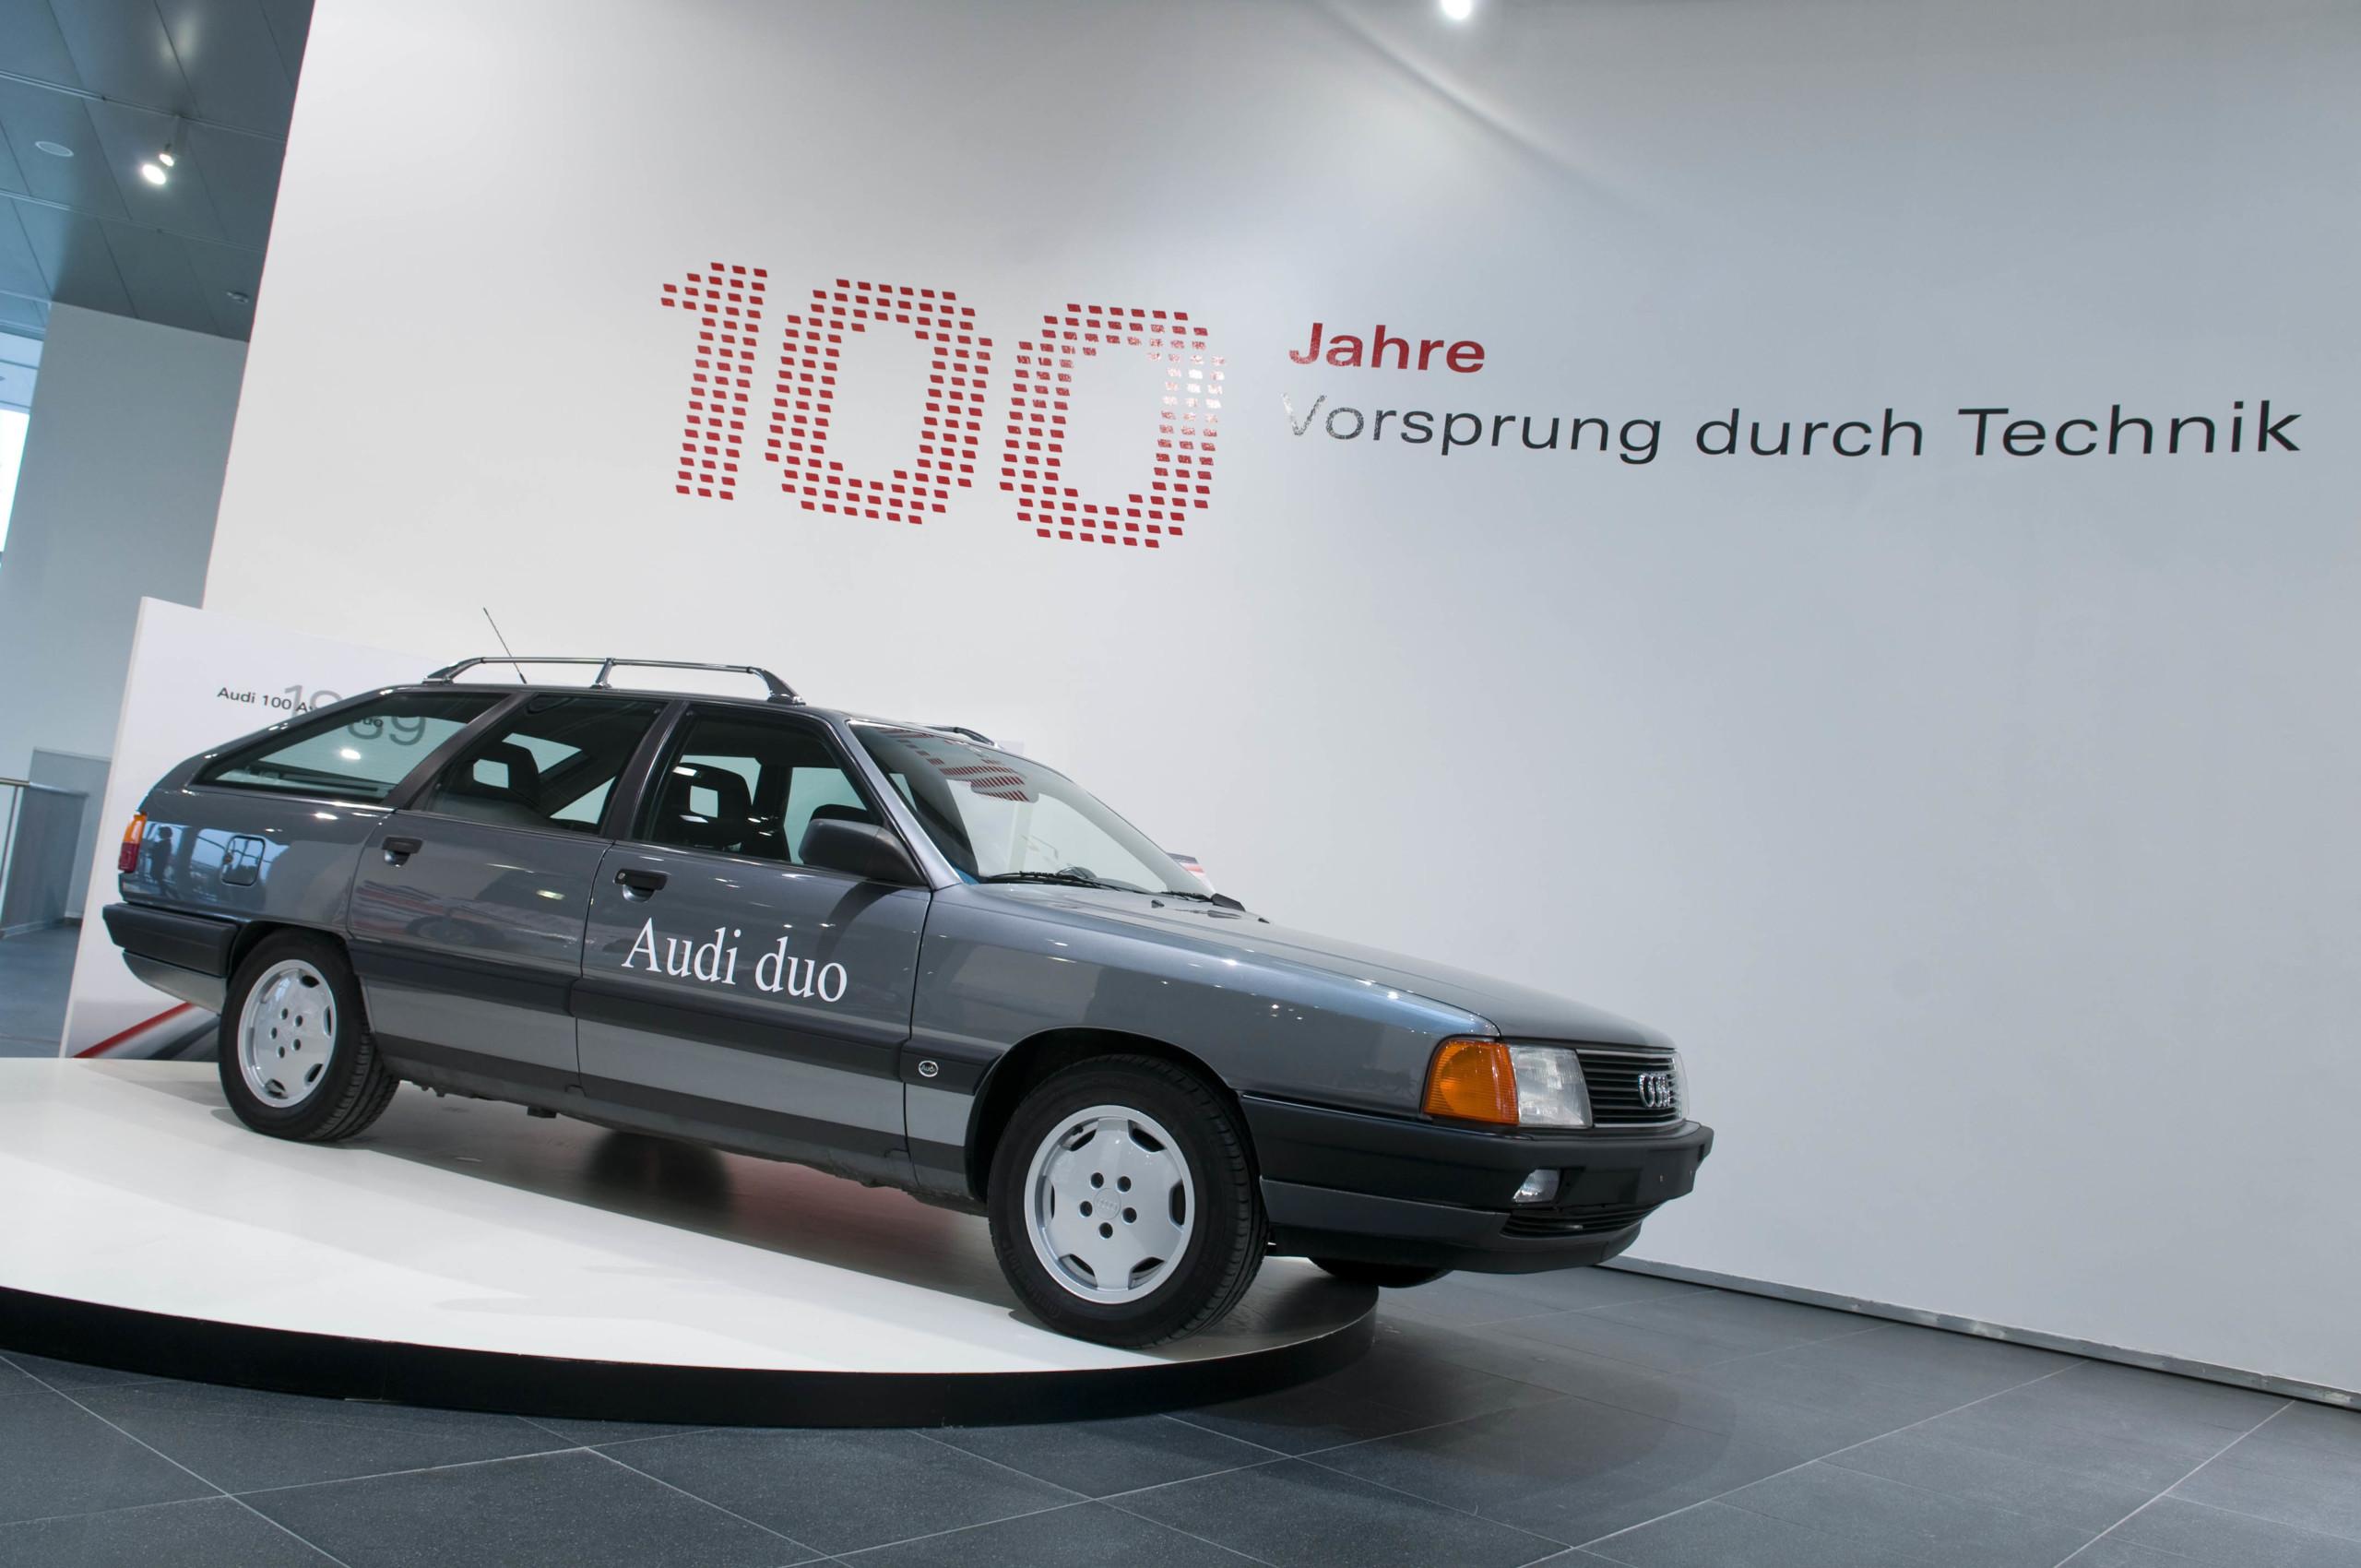 Foto de Audi Duo (9/12)